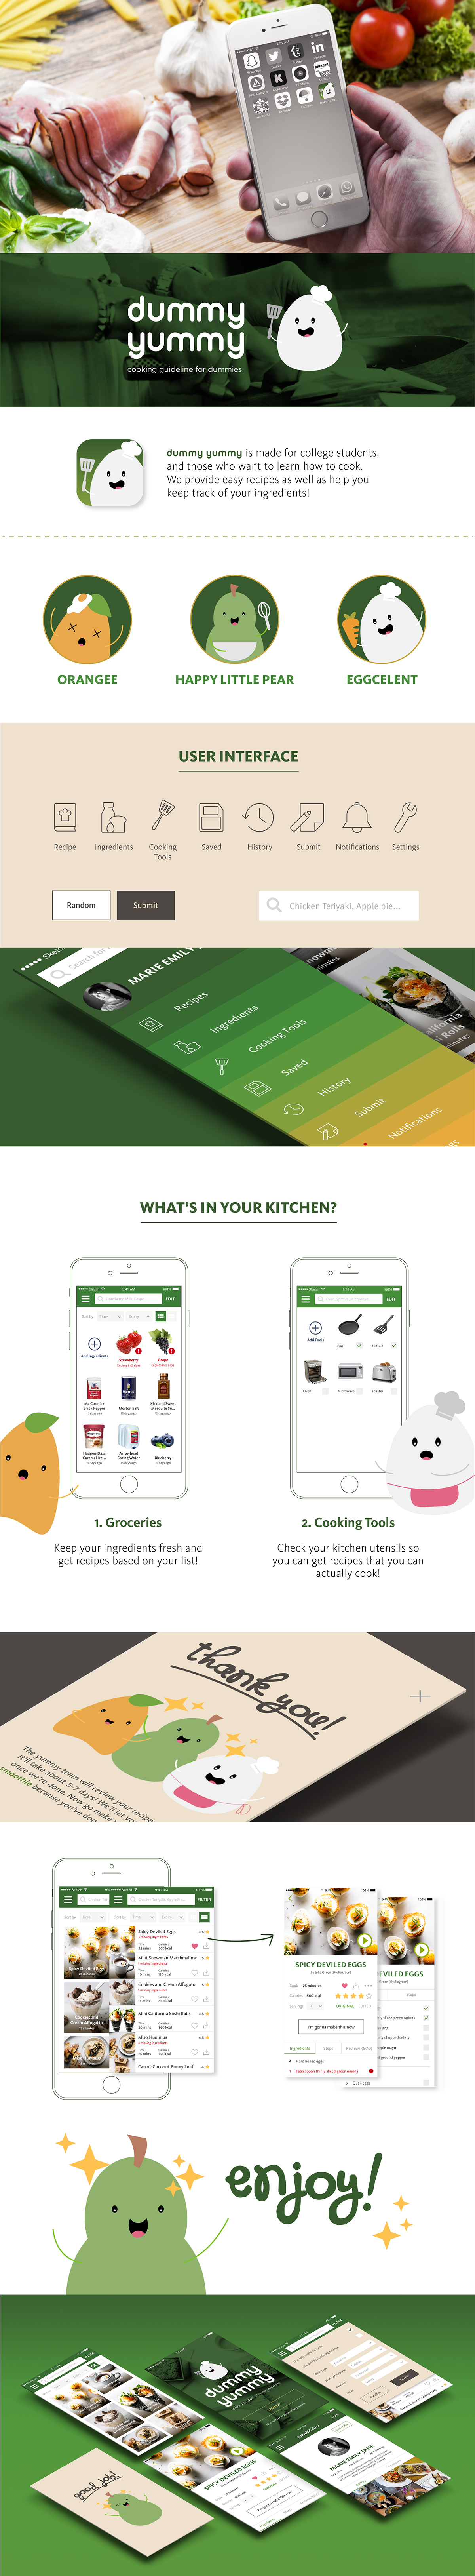 cooking iphone ui design user interface ios application mobile app UI ux